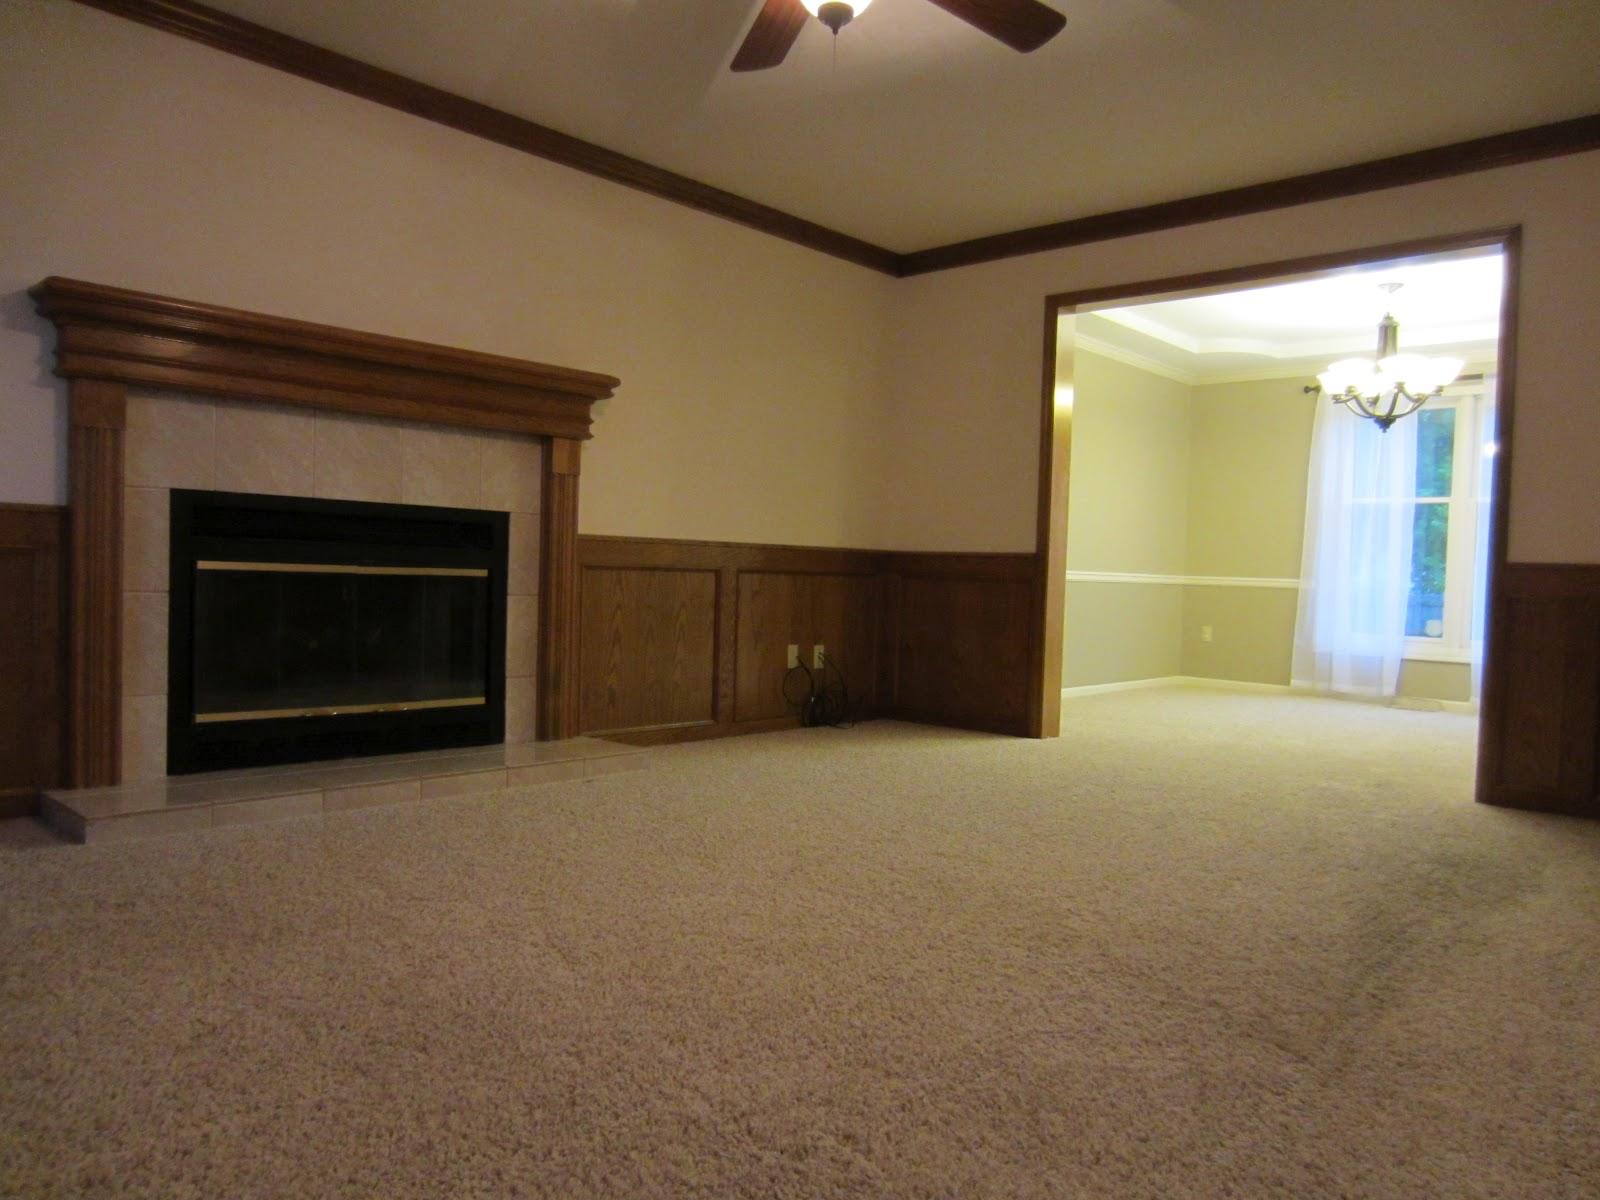 Blue 11 Interiors New House Living Room